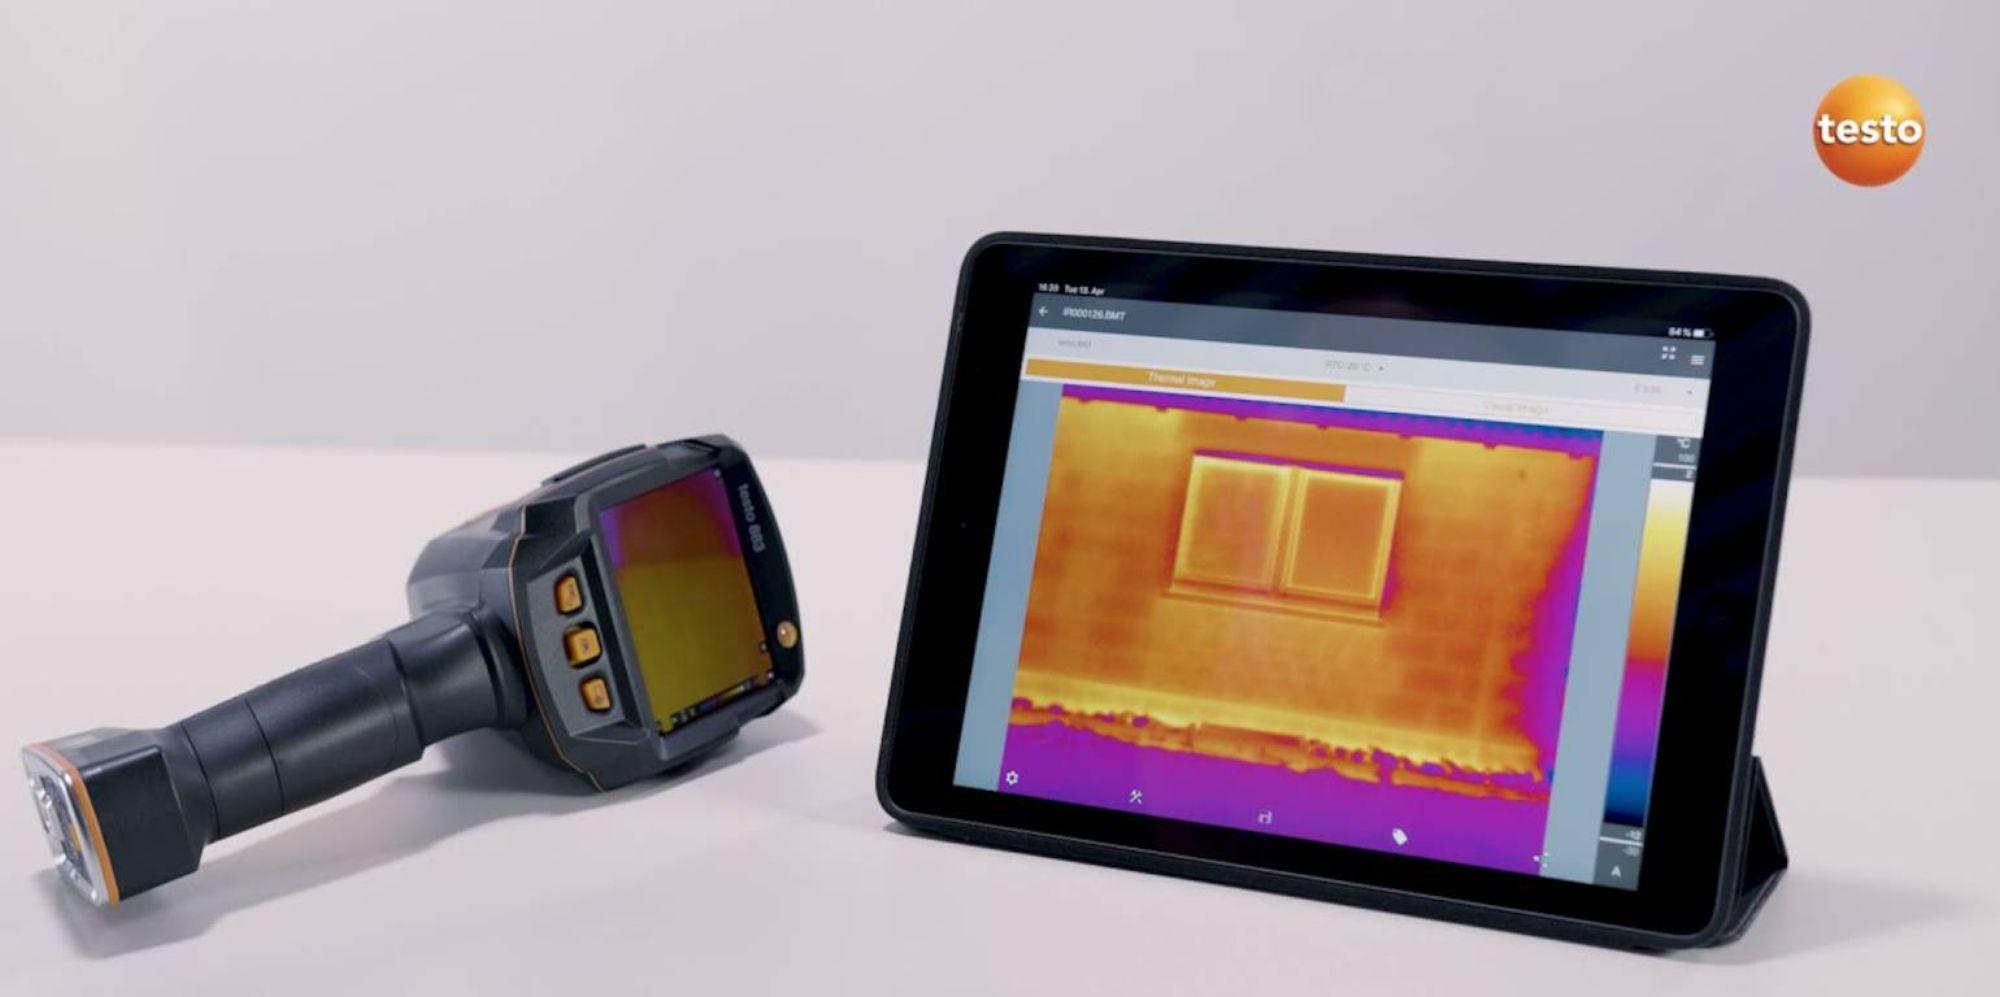 testo Thermography App